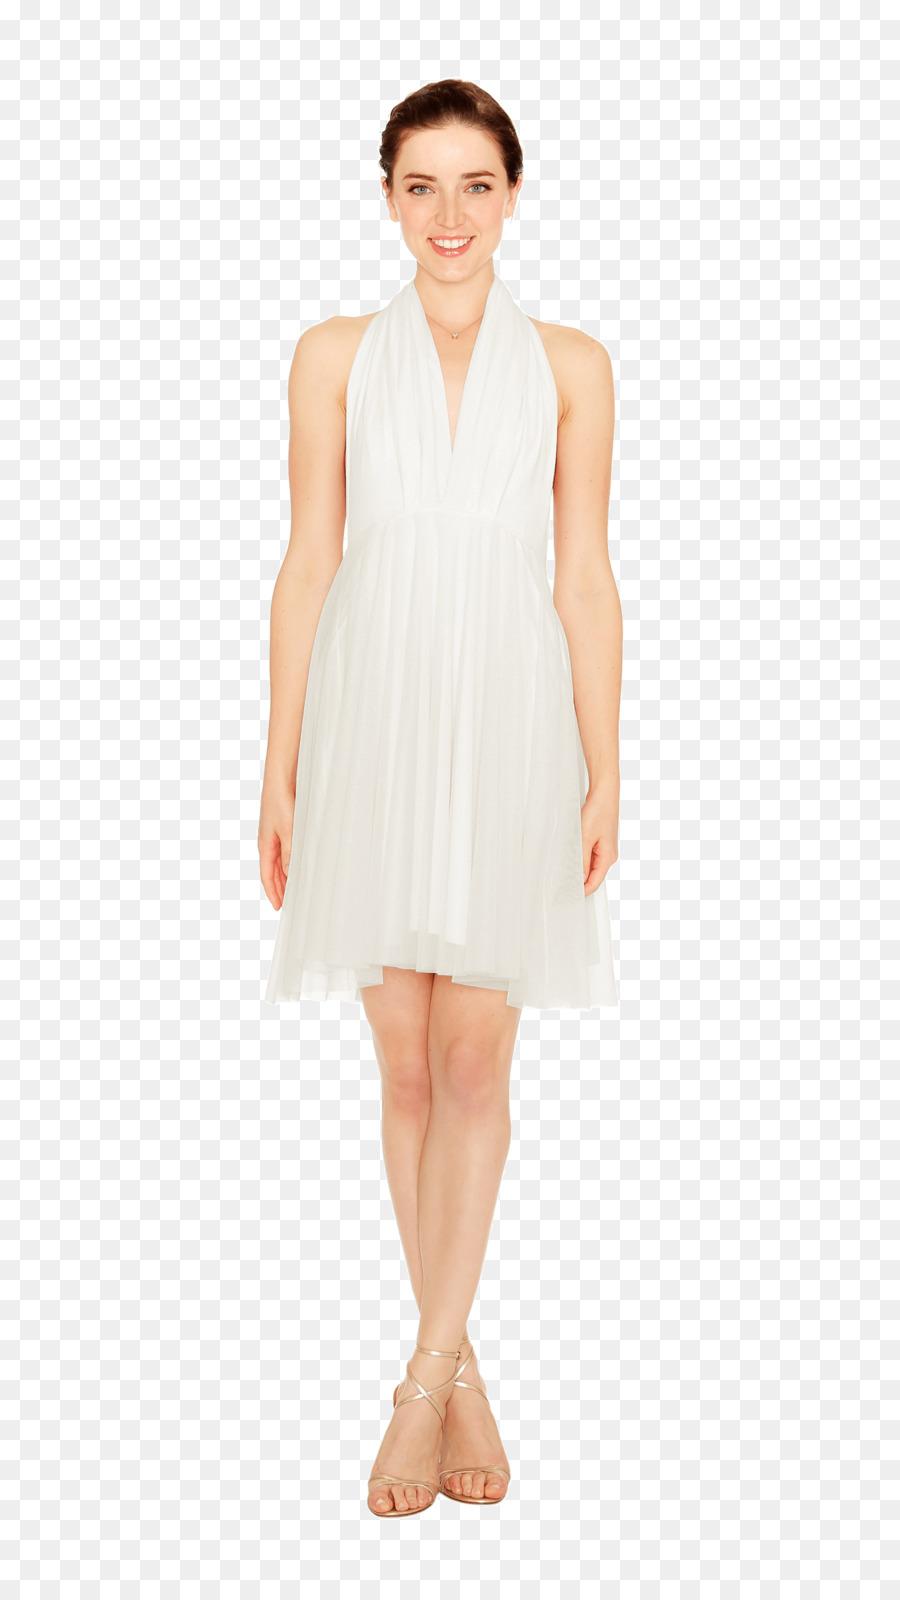 Zapata Kleidung Hochzeit Mantel Areto Kleid Png Yb7yf6gv